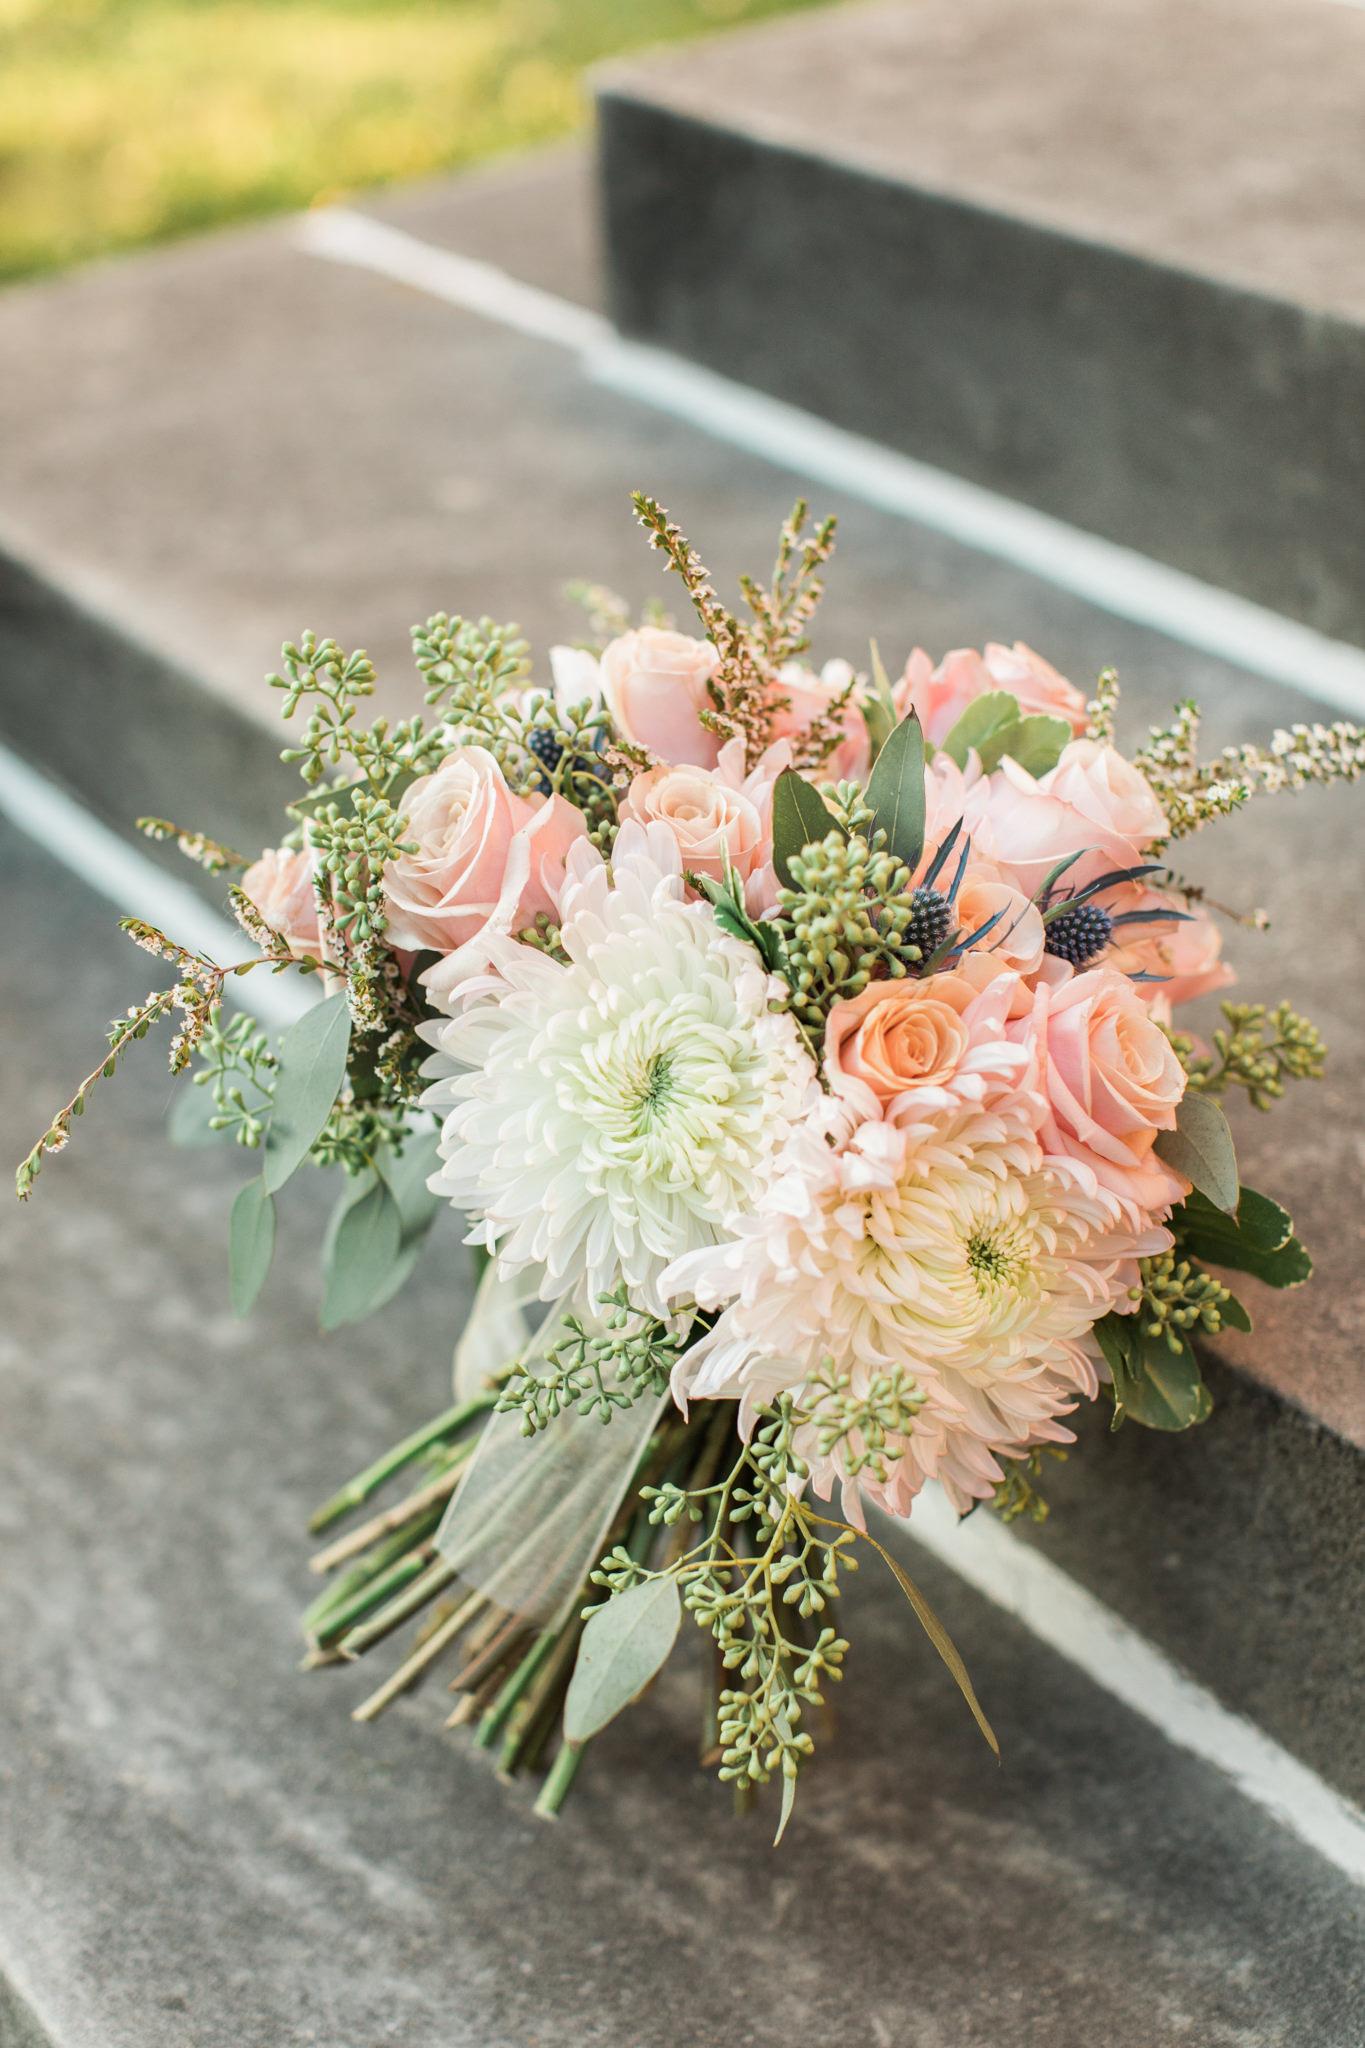 Bouquet outside on steps at Gardencourt Louisville Wedding Venue